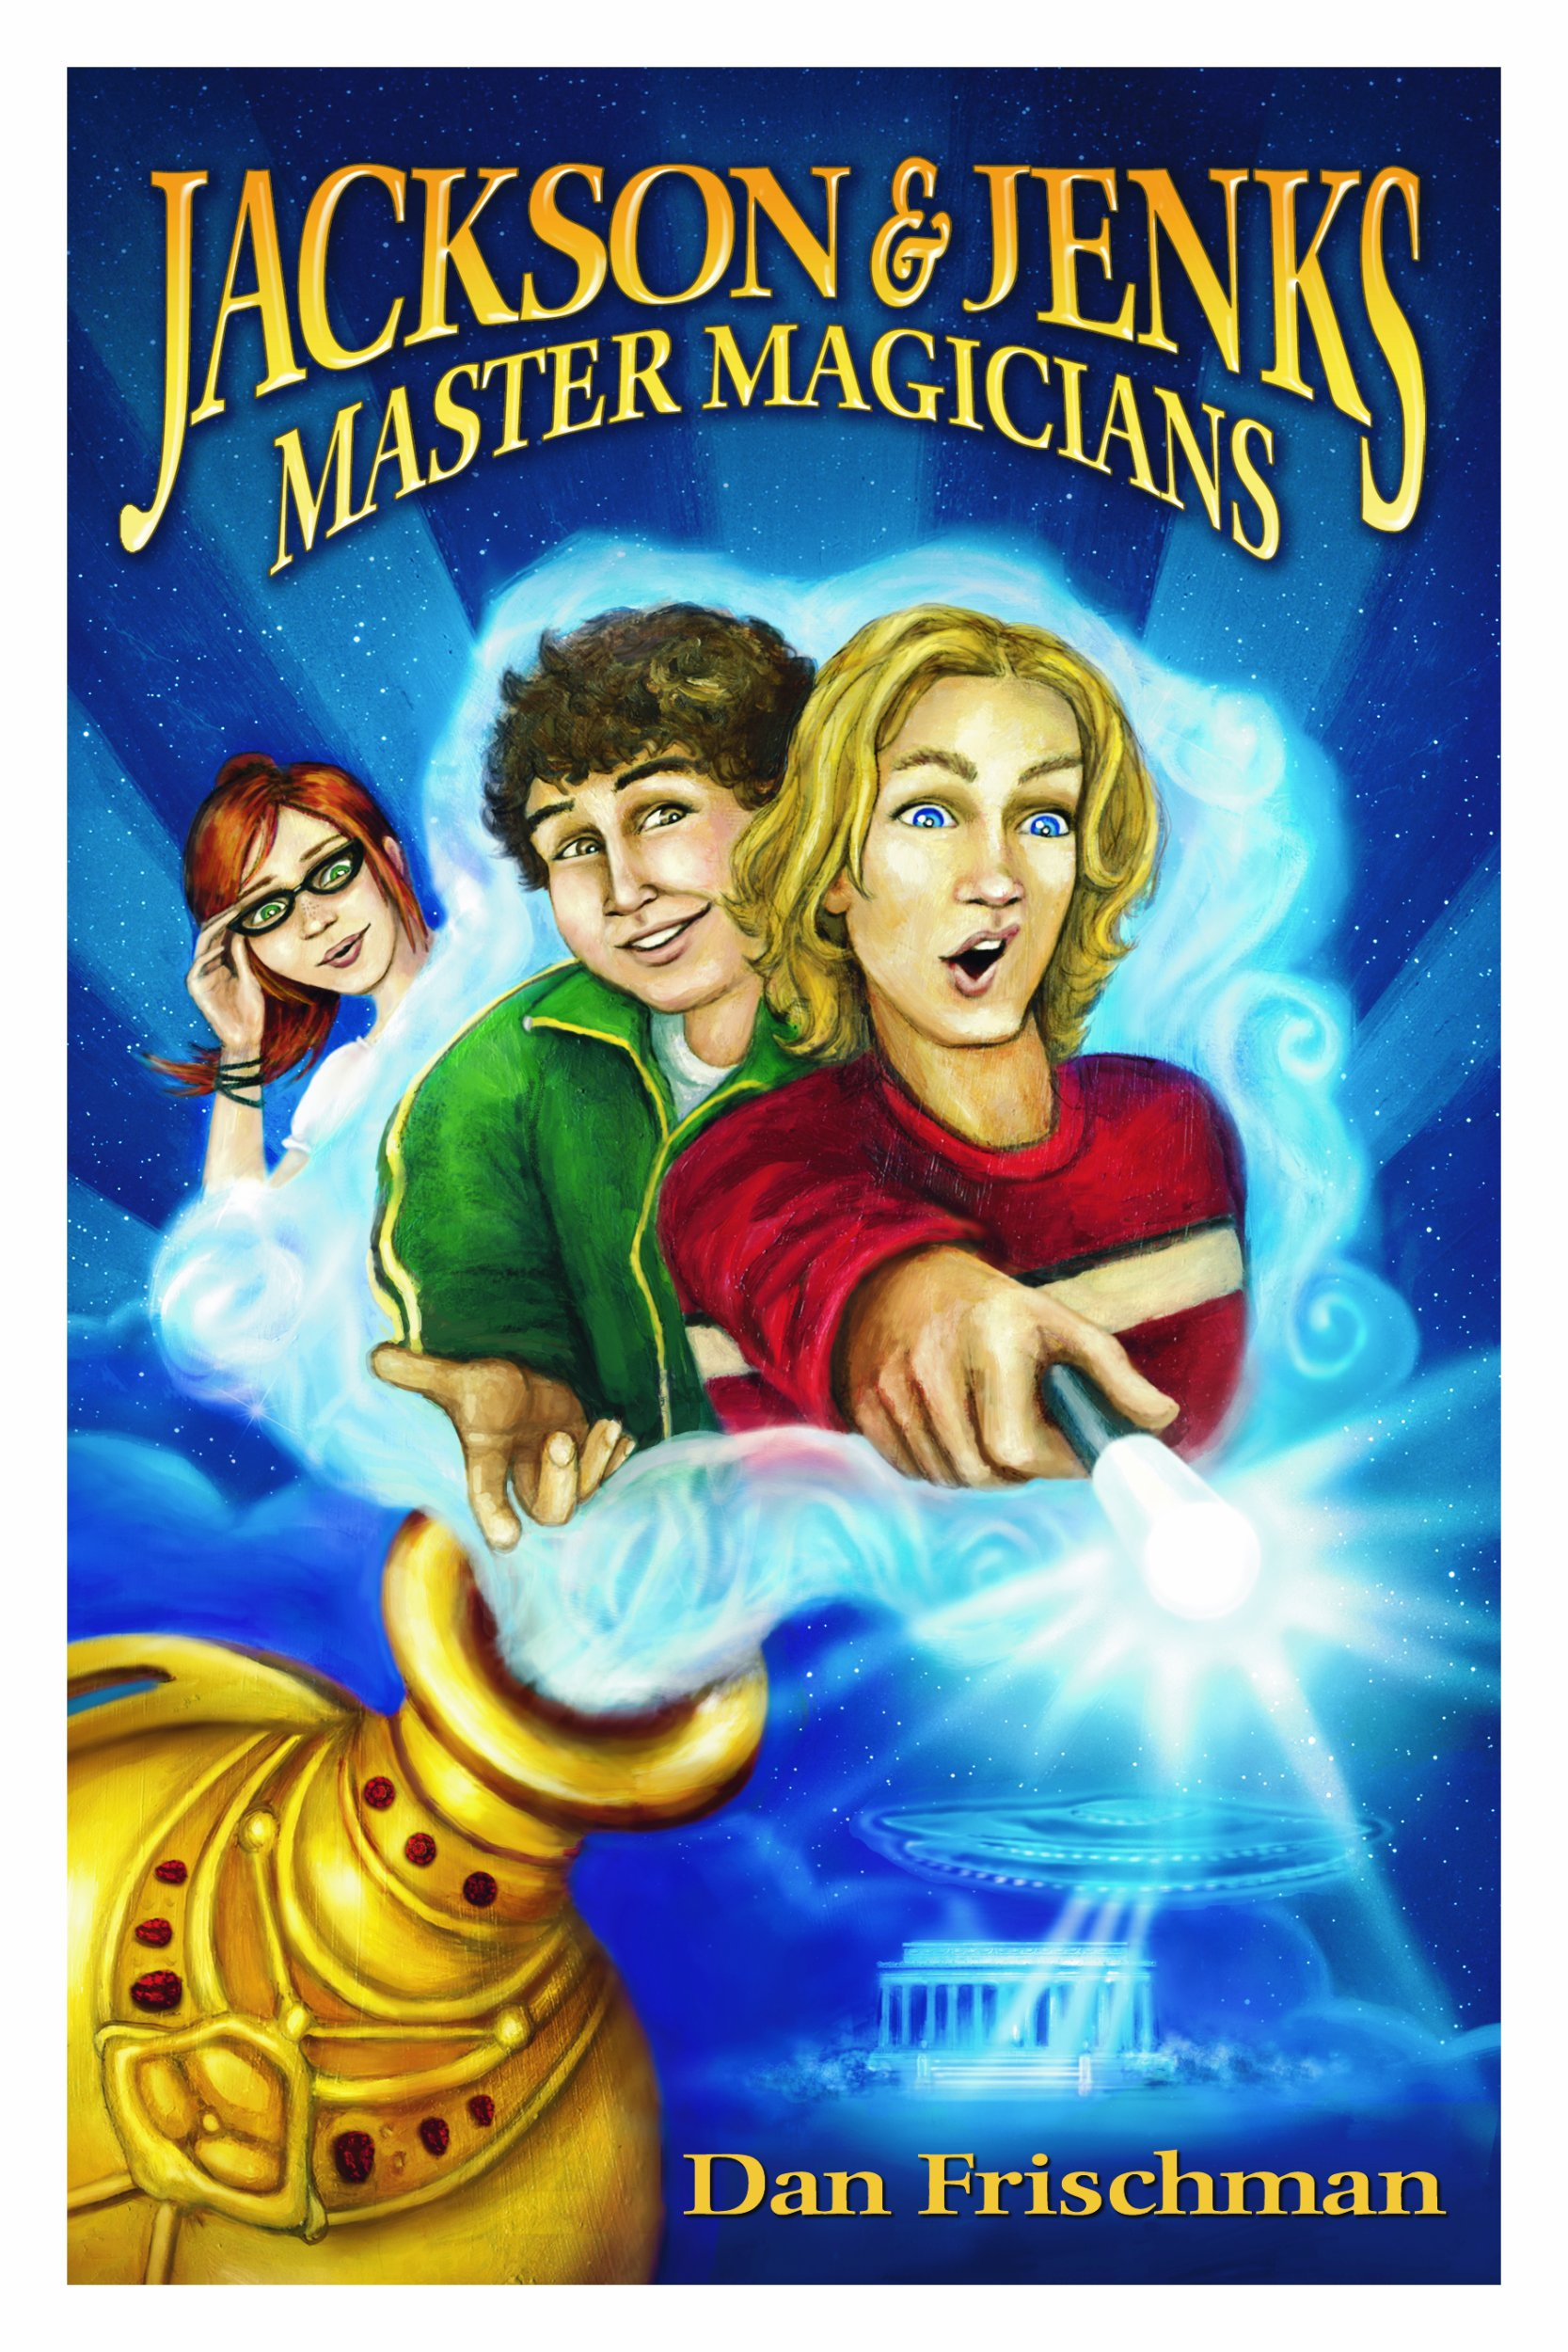 Jackson & Jenks, Master Magicians Hardcover – April 7, 2009